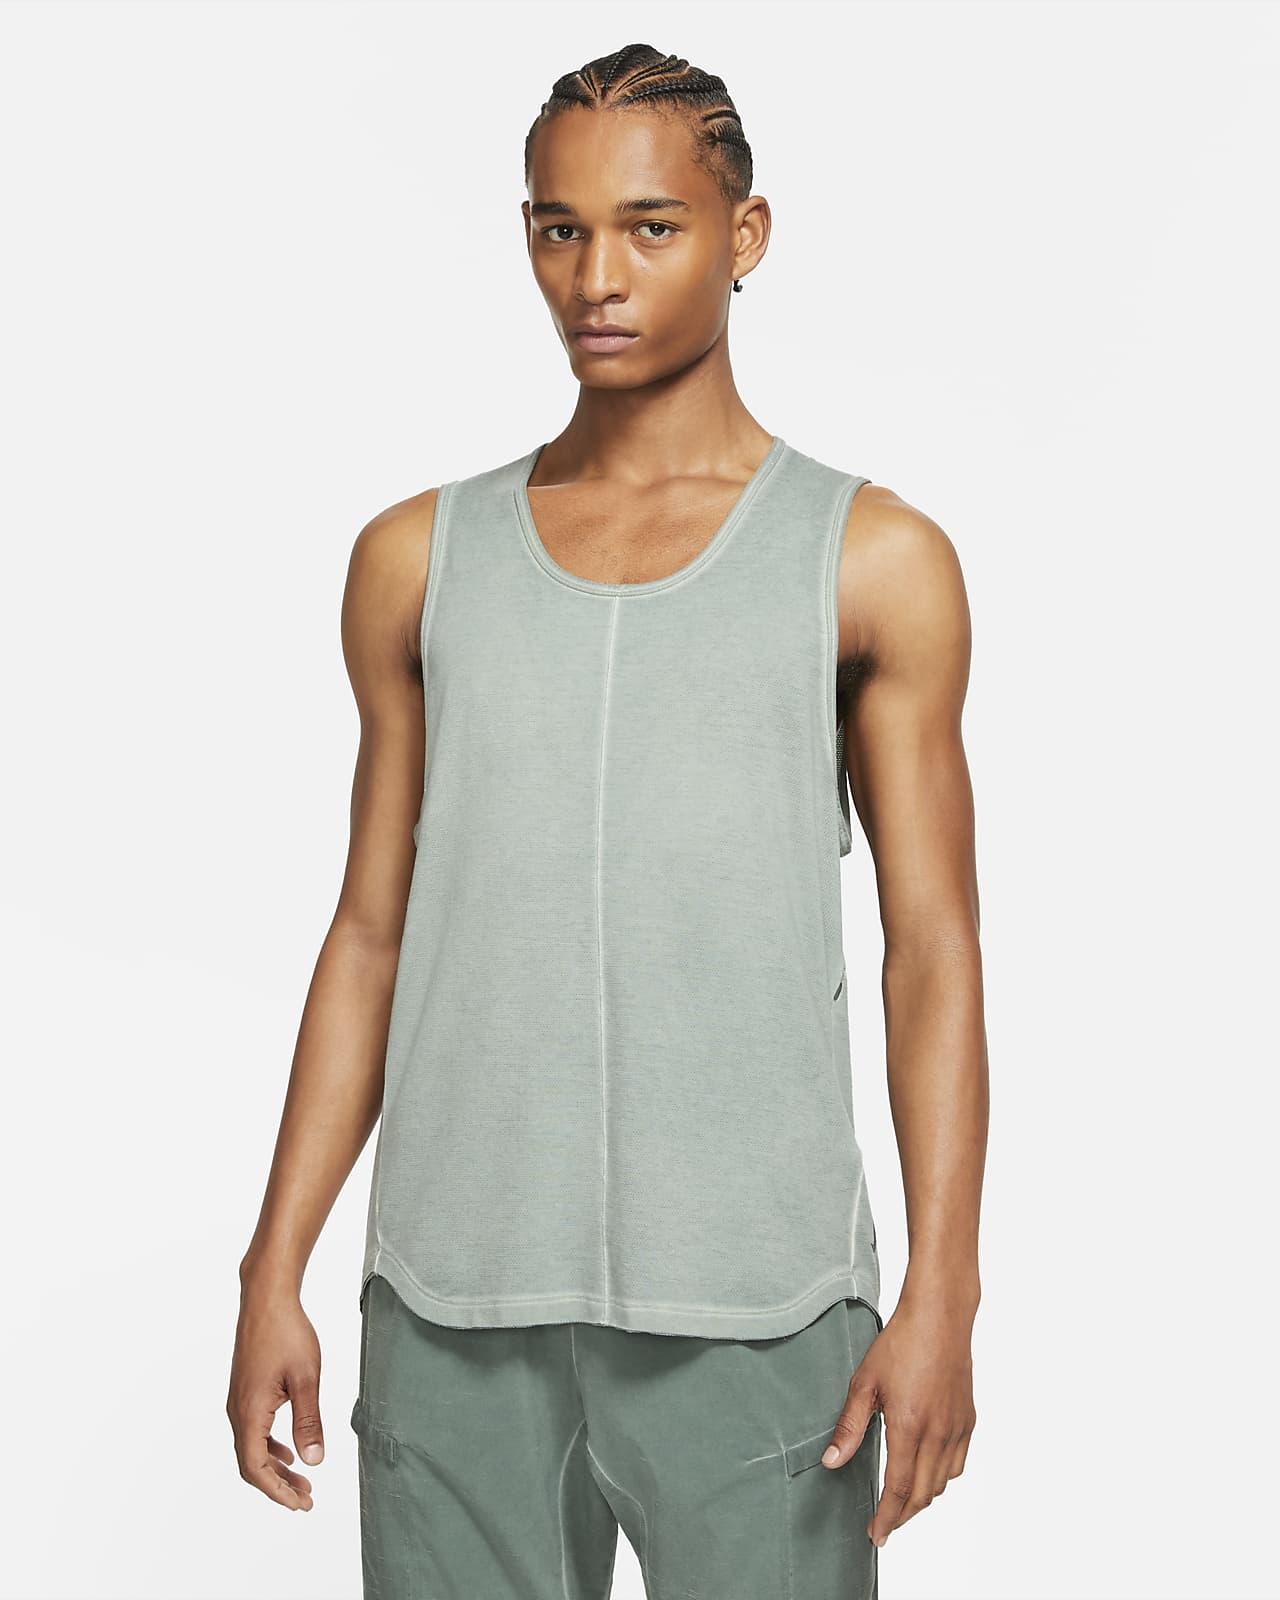 Camiseta de tirantes para hombre Nike Yoga Dri-FIT